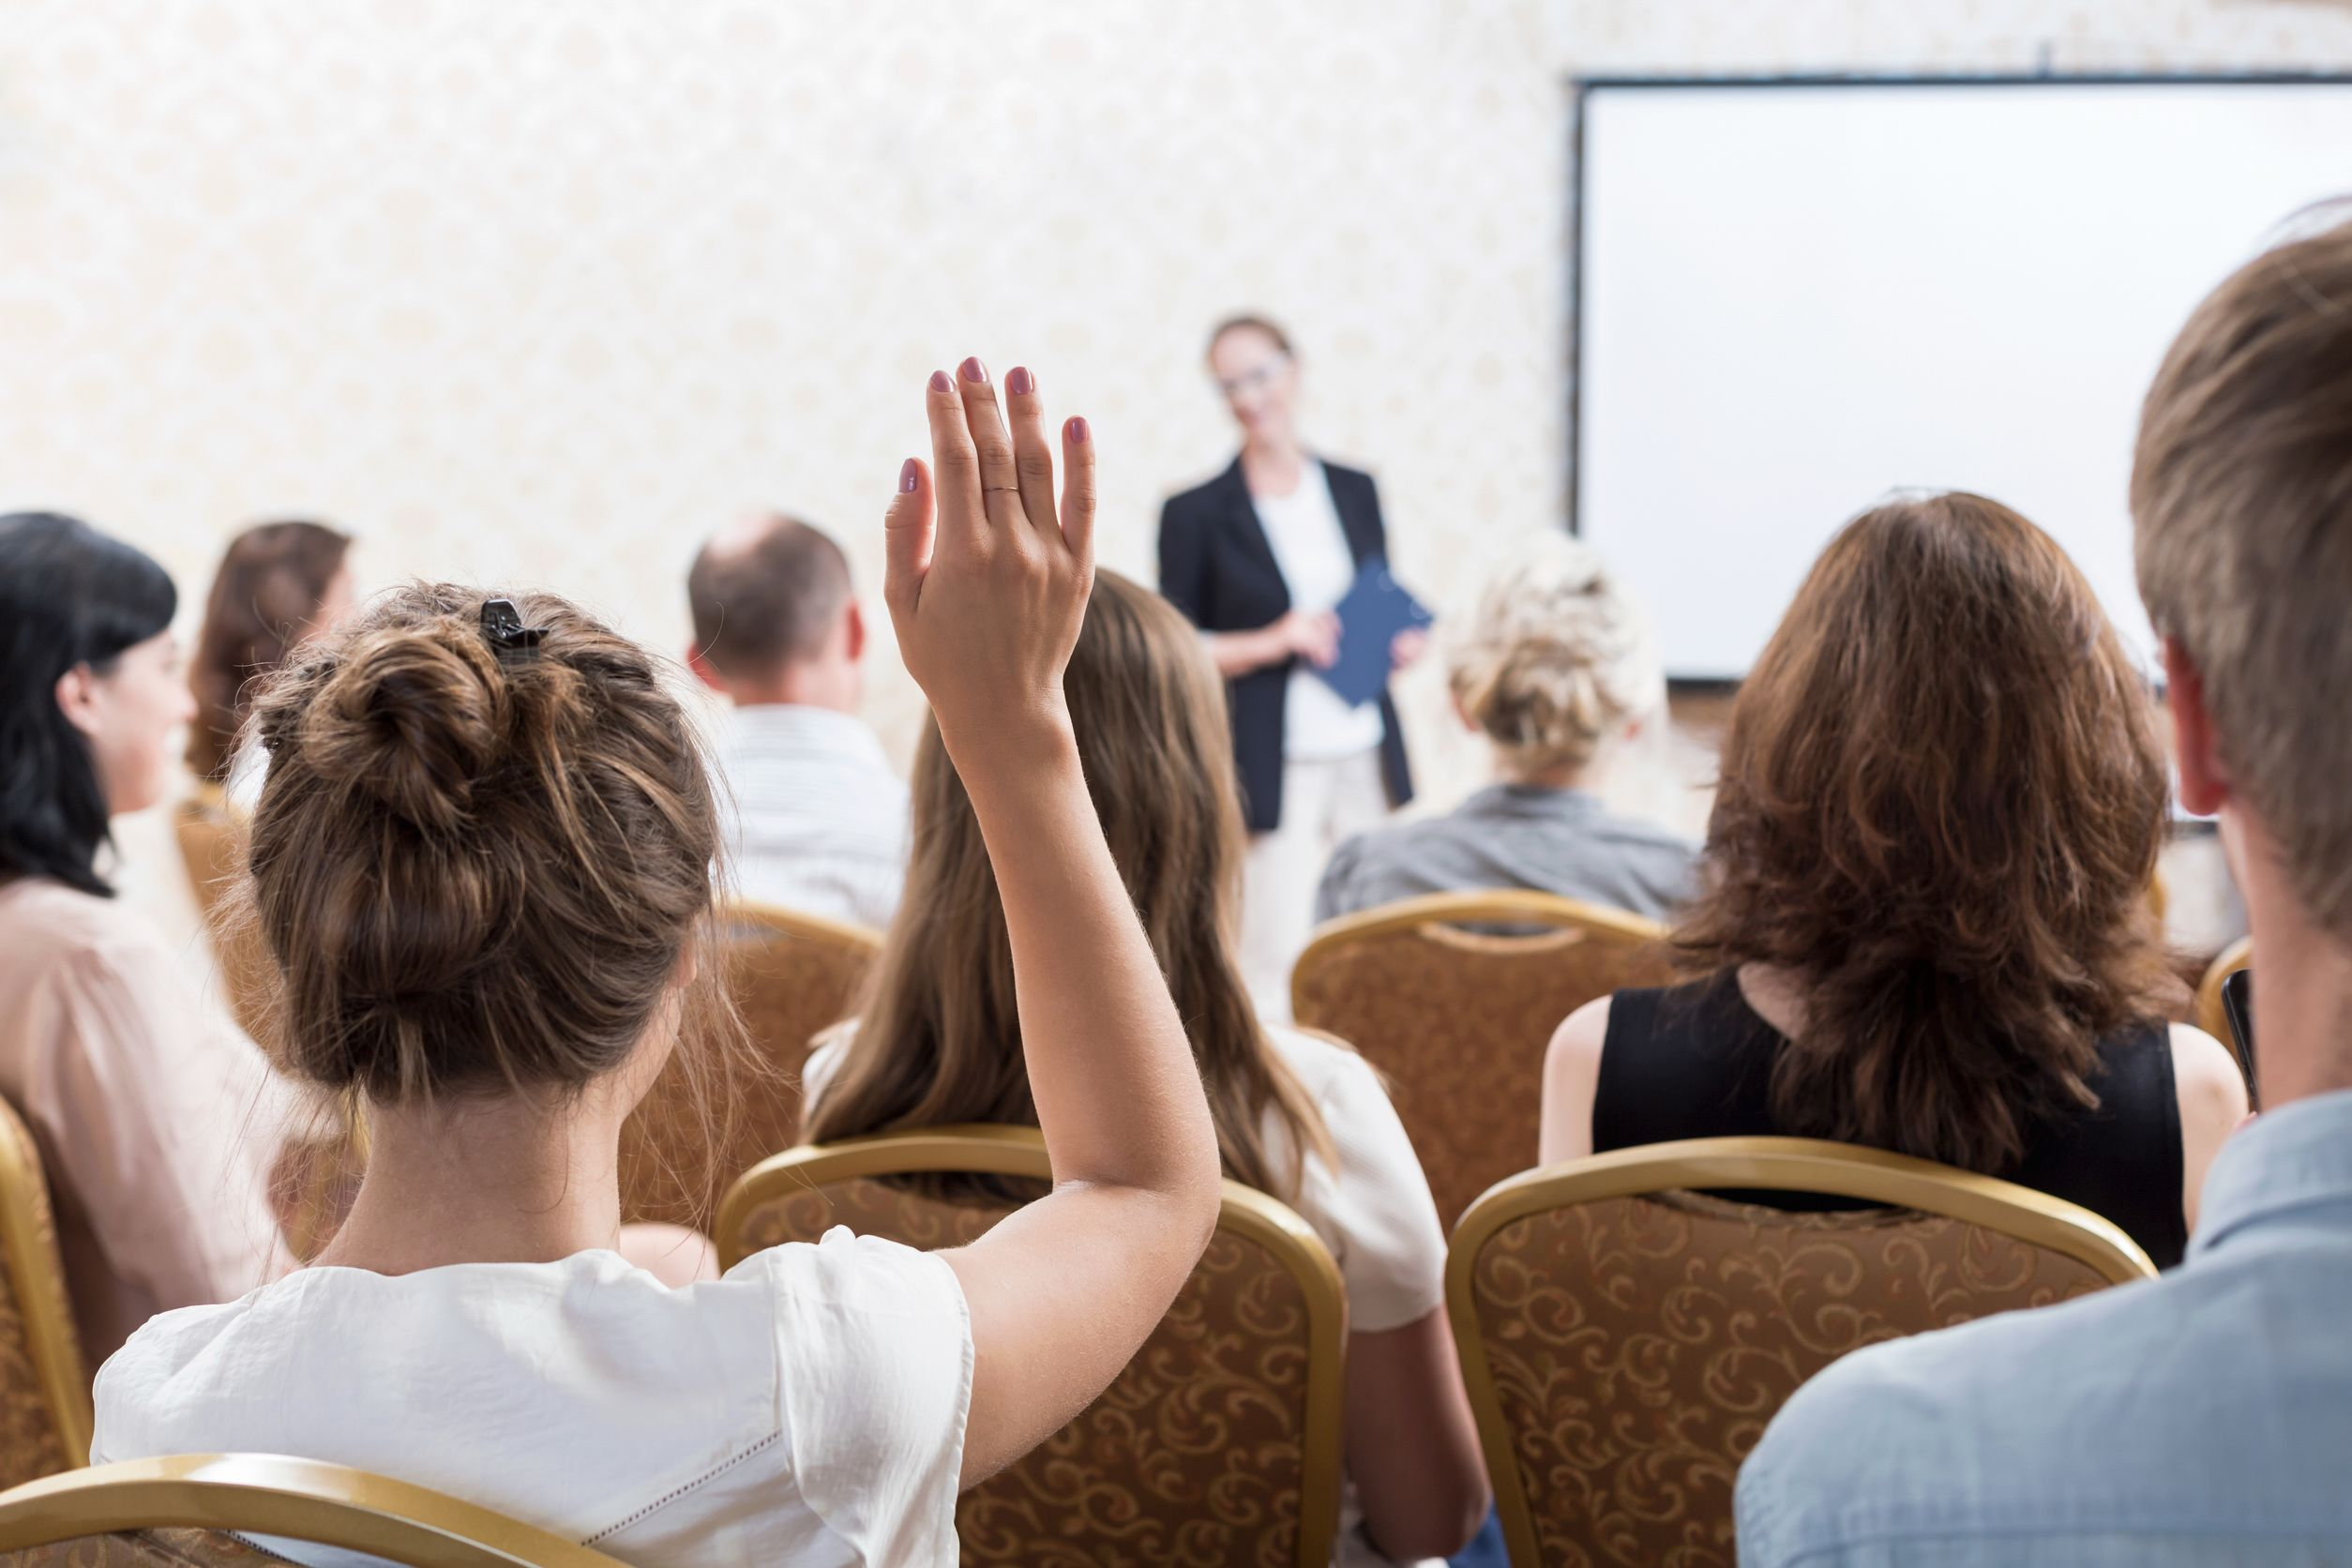 Photo description: listener raising hand to ask question during seminar.